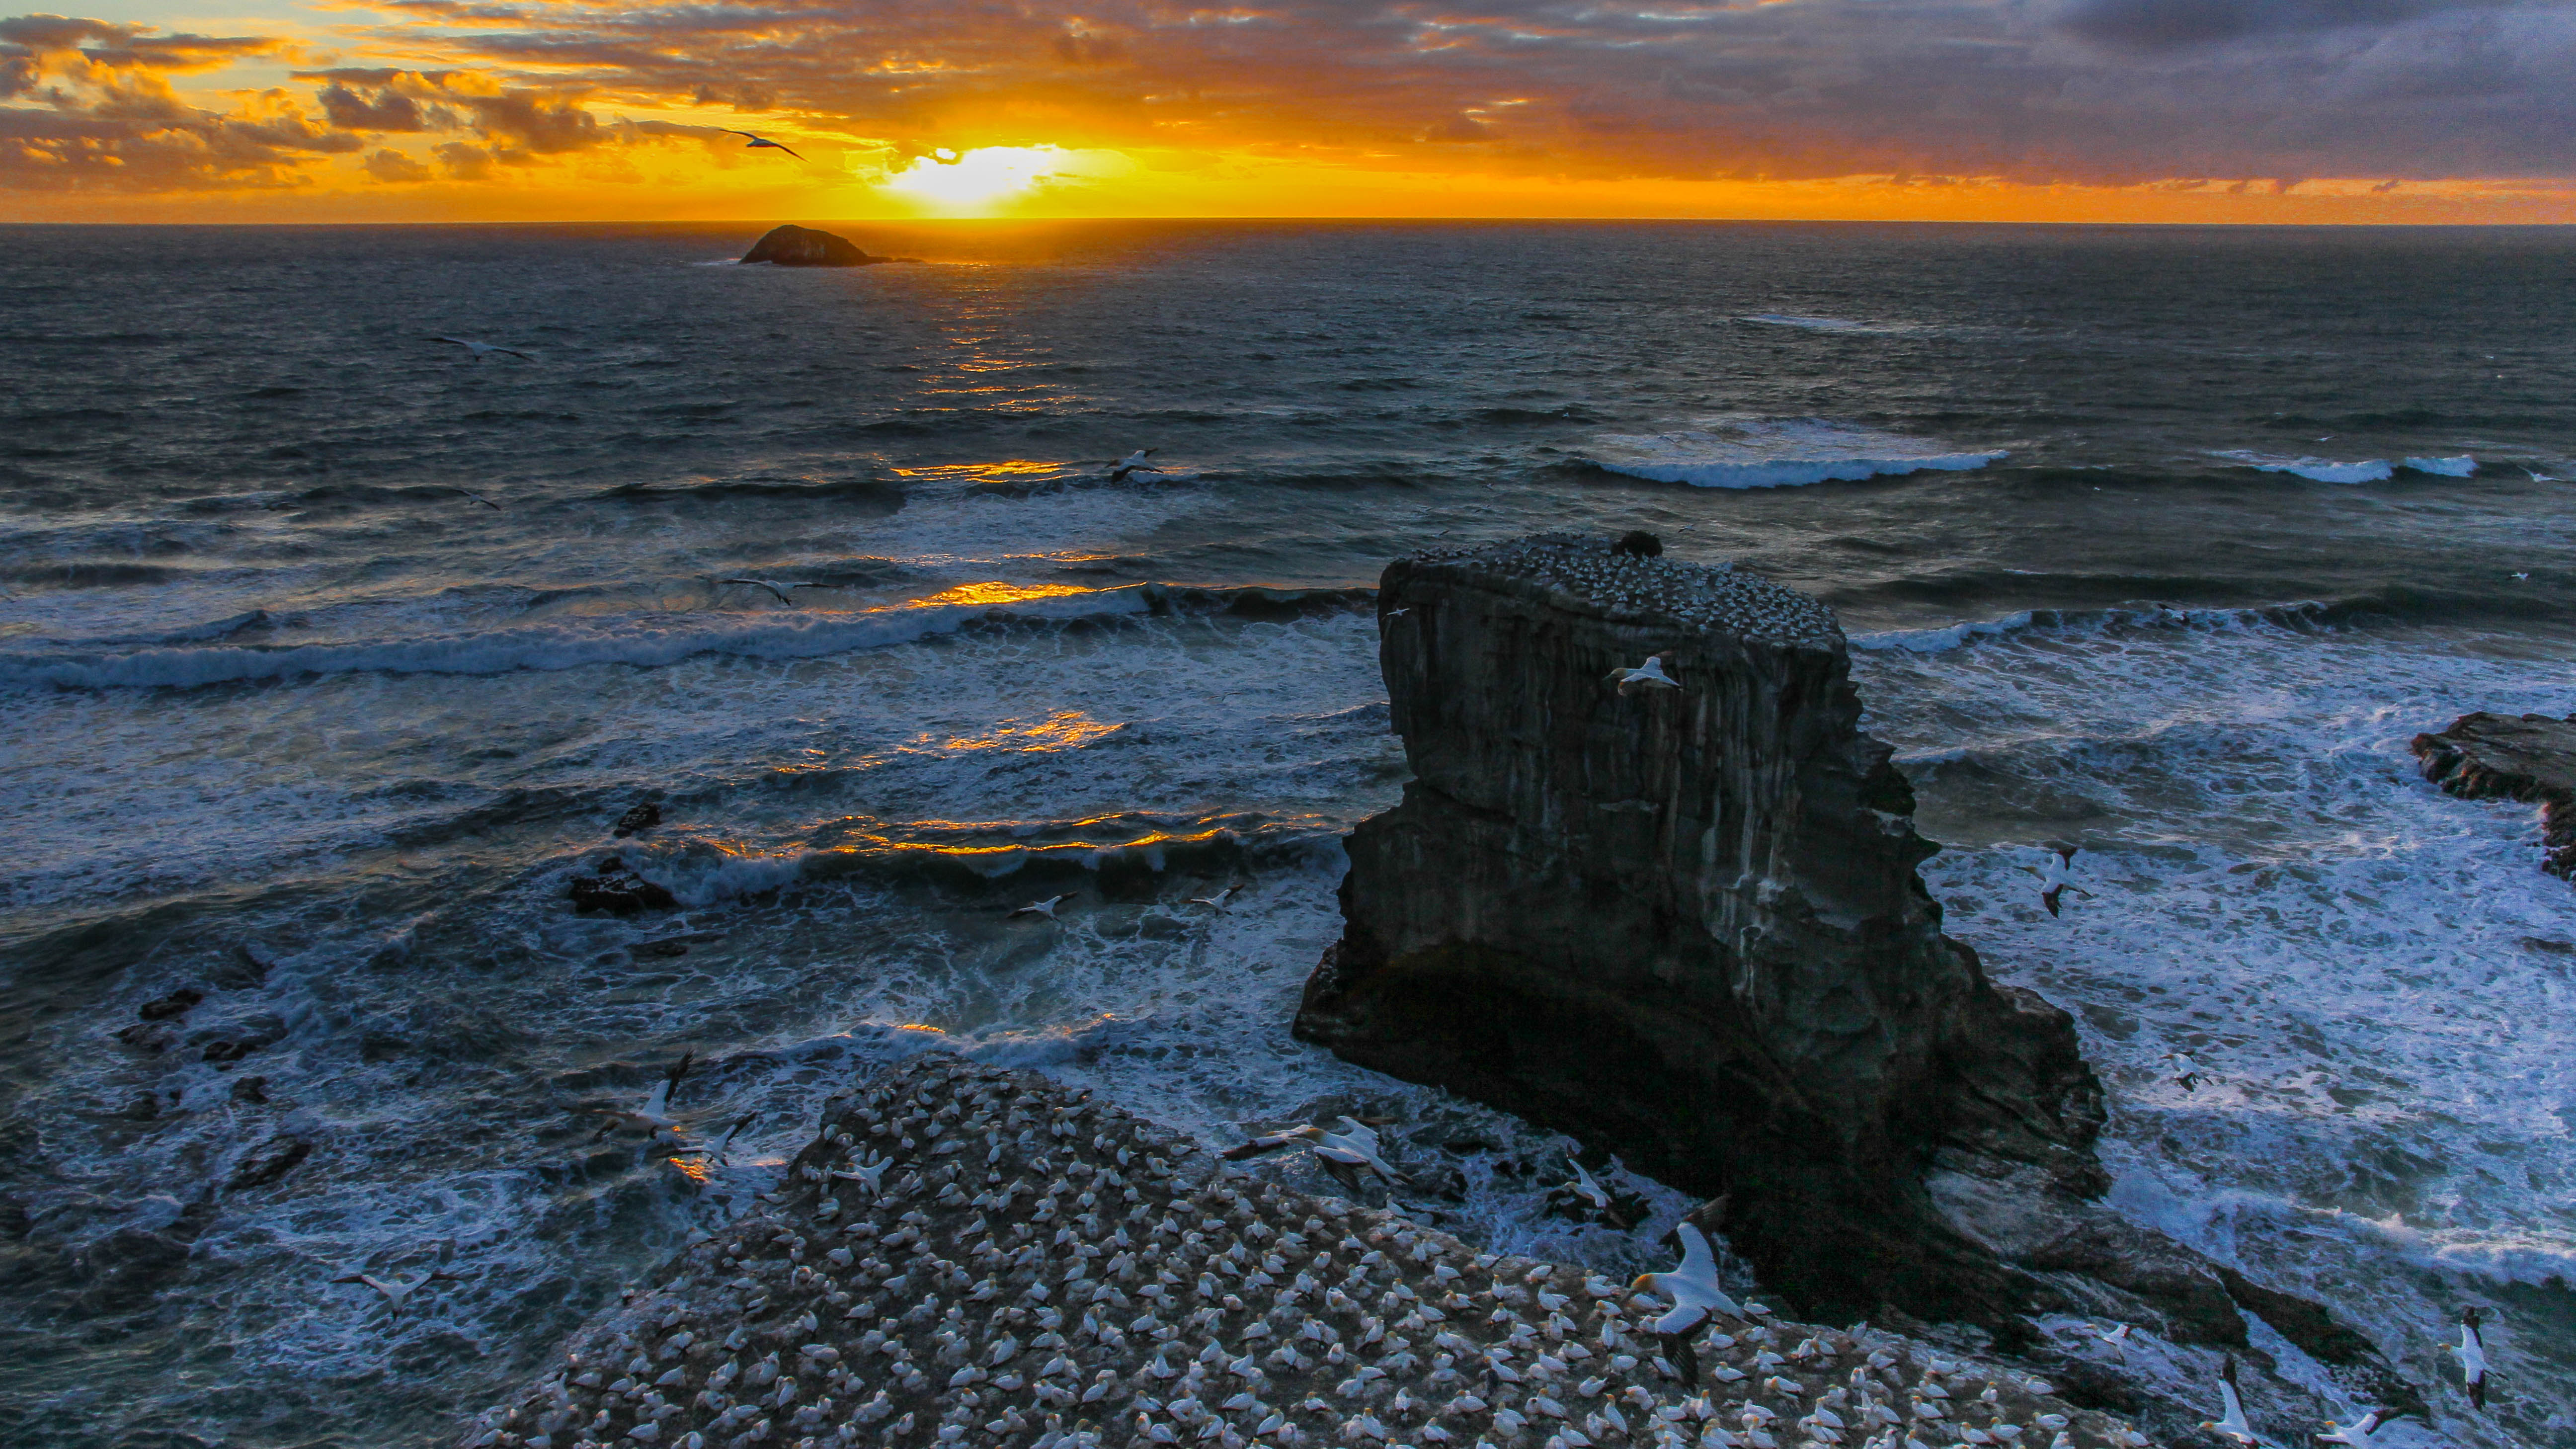 NZ Auckland Muriwai Gannet Colony Sunet 06.jpg